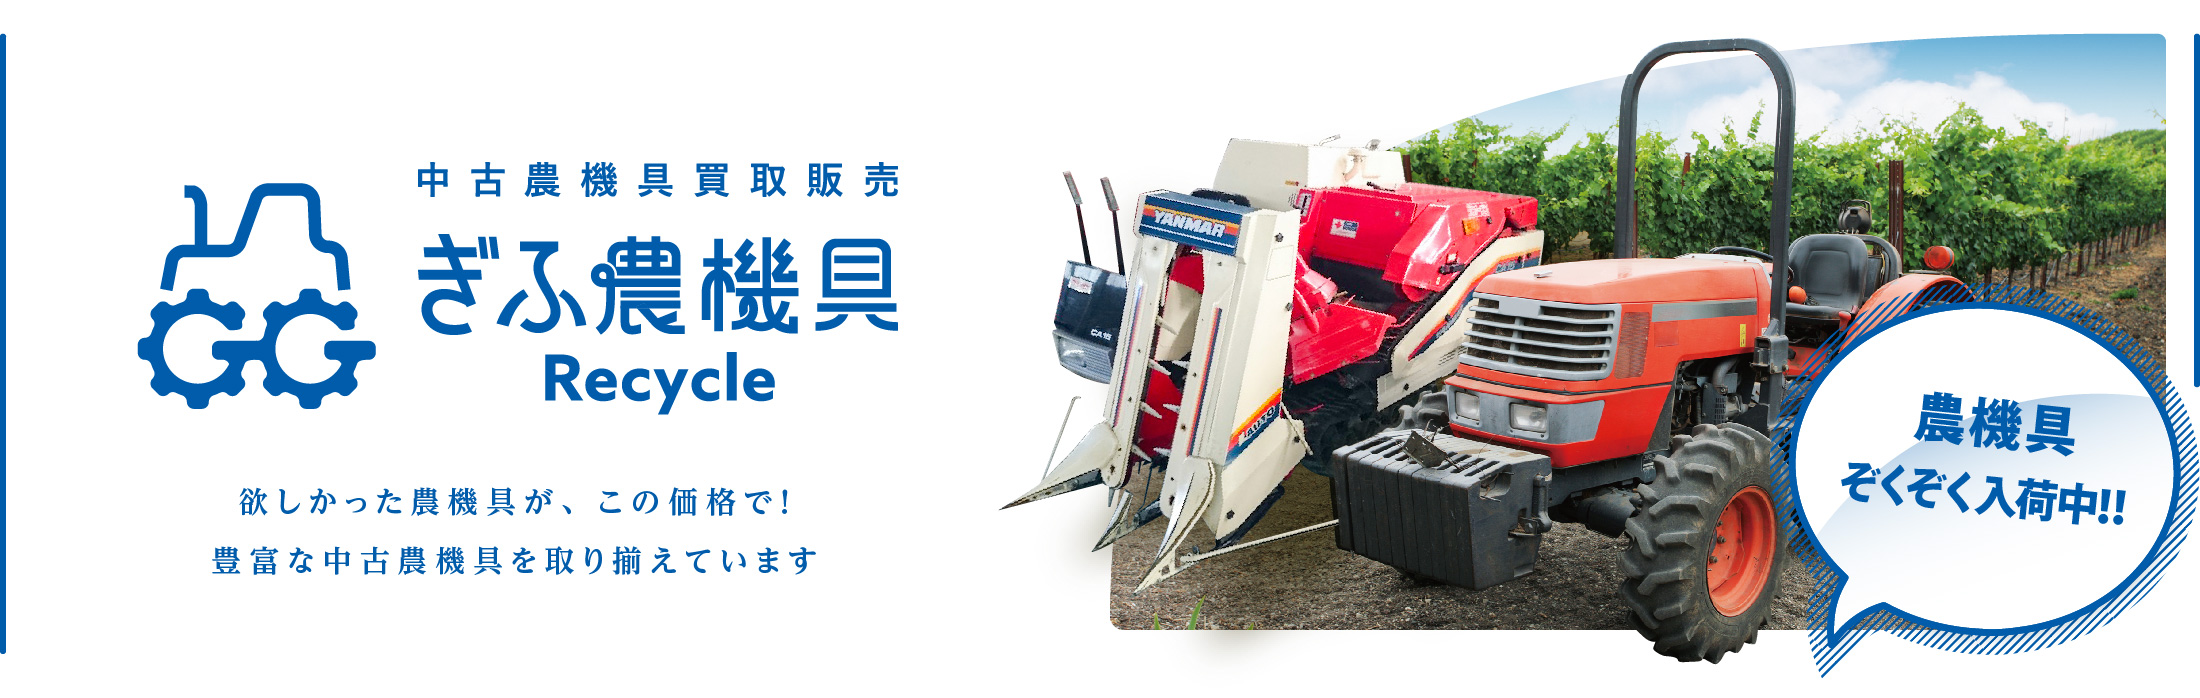 中古農機具買取販売ぎふ農機具Recylce